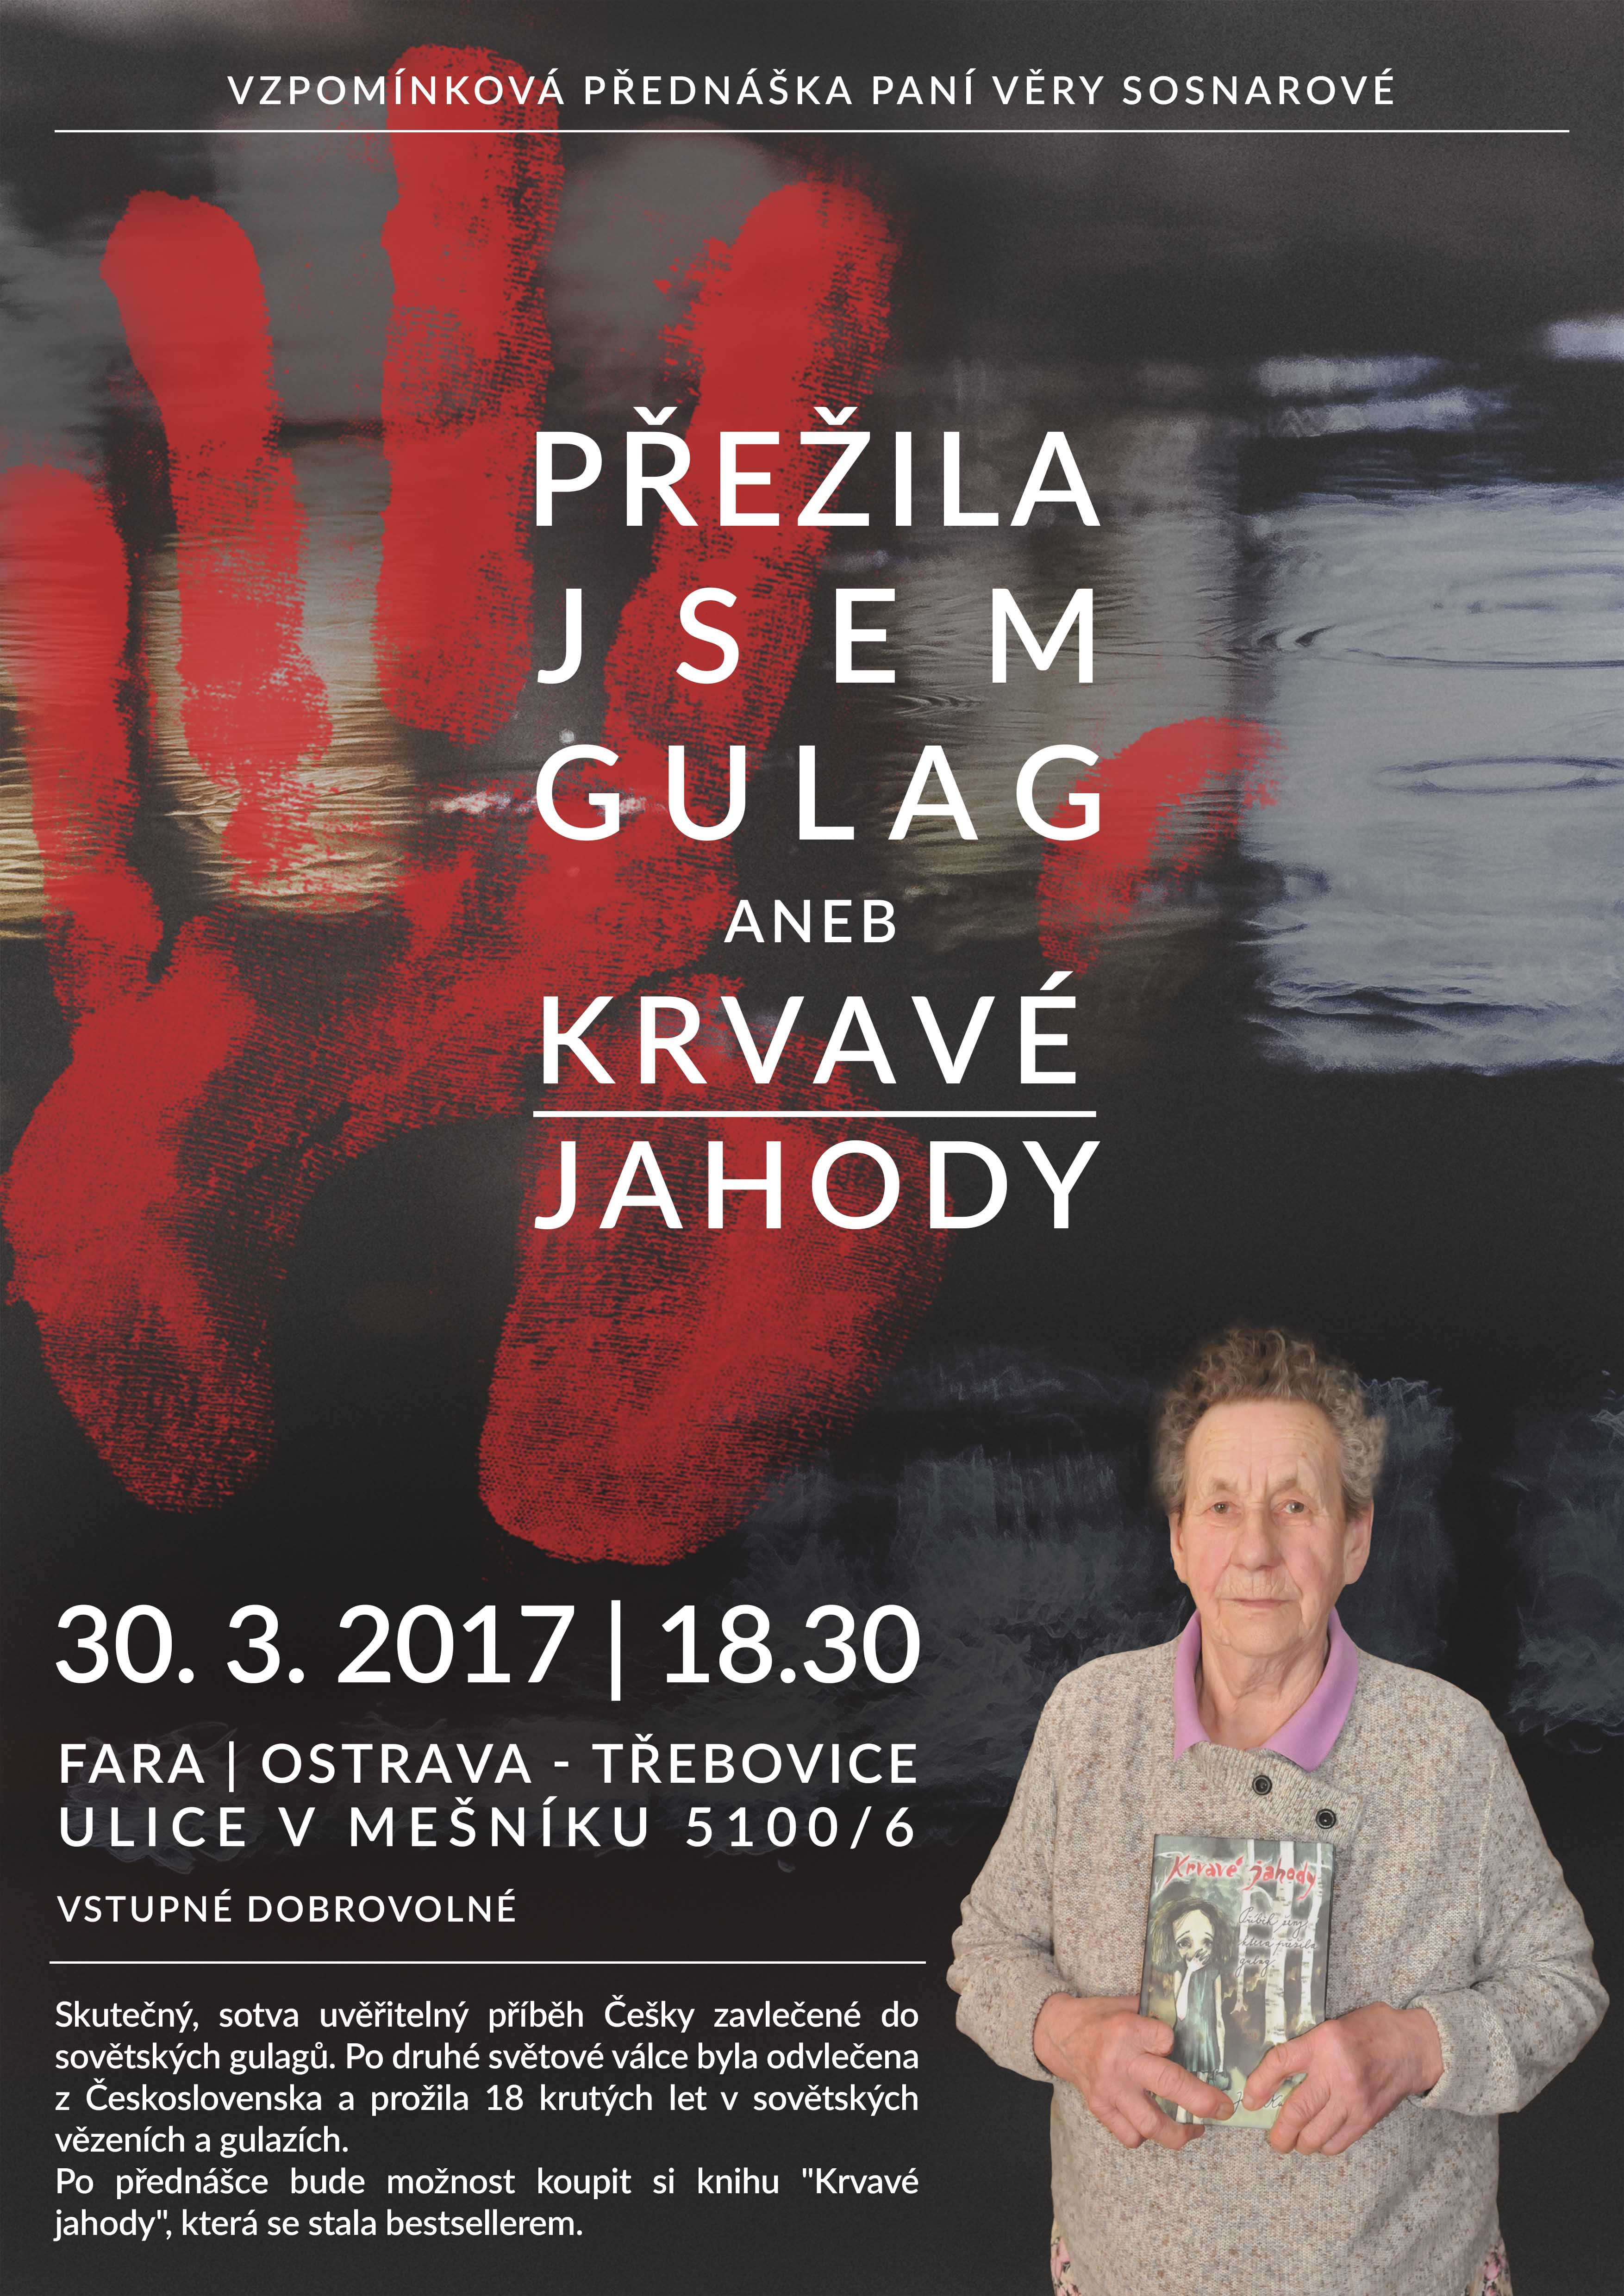 20170330-Prednaska Prezila jsem gulag